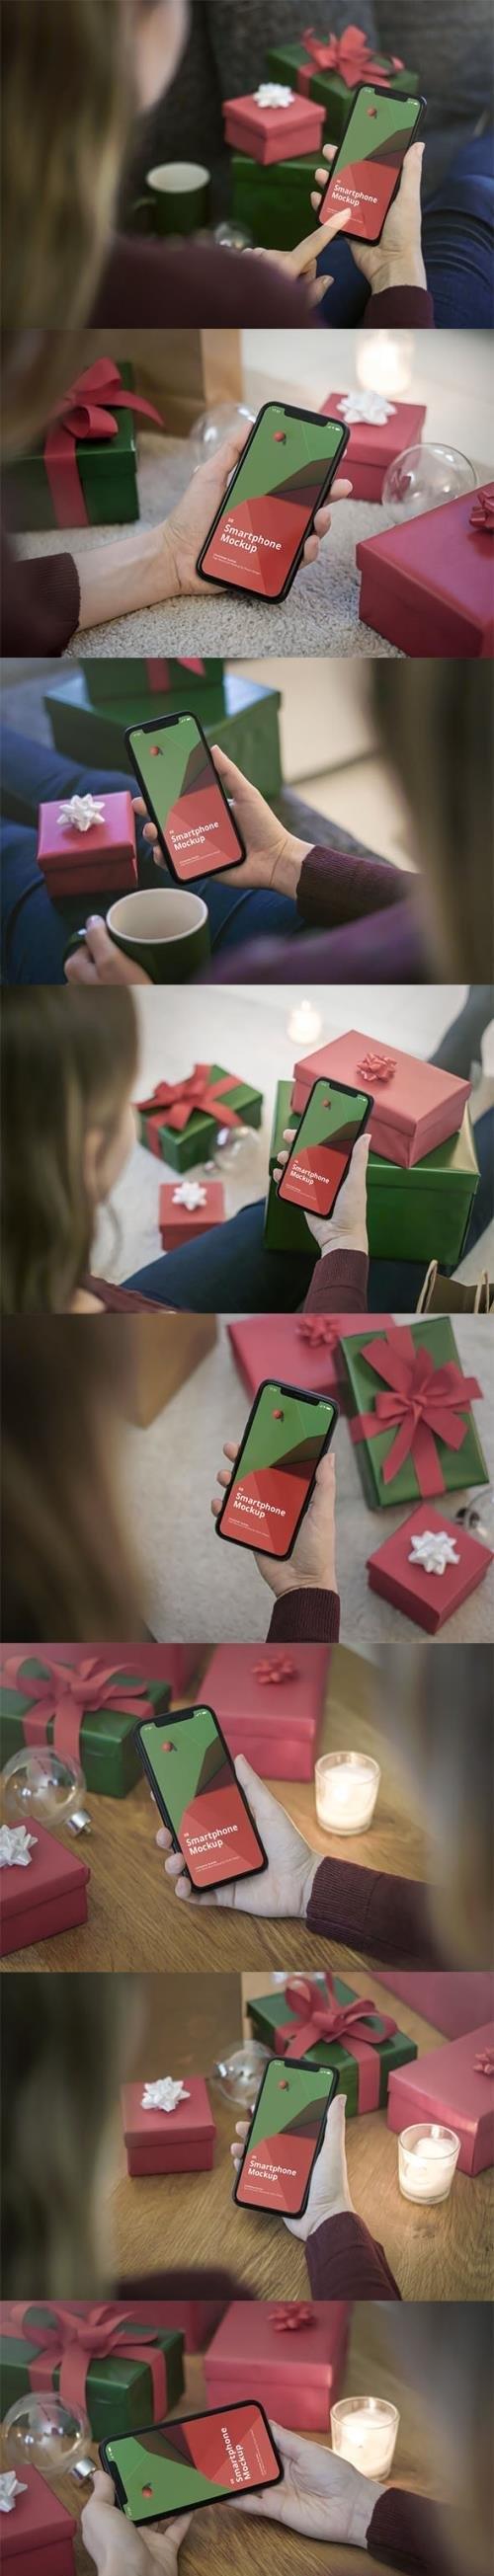 Phone Mockup Christmas Scenes